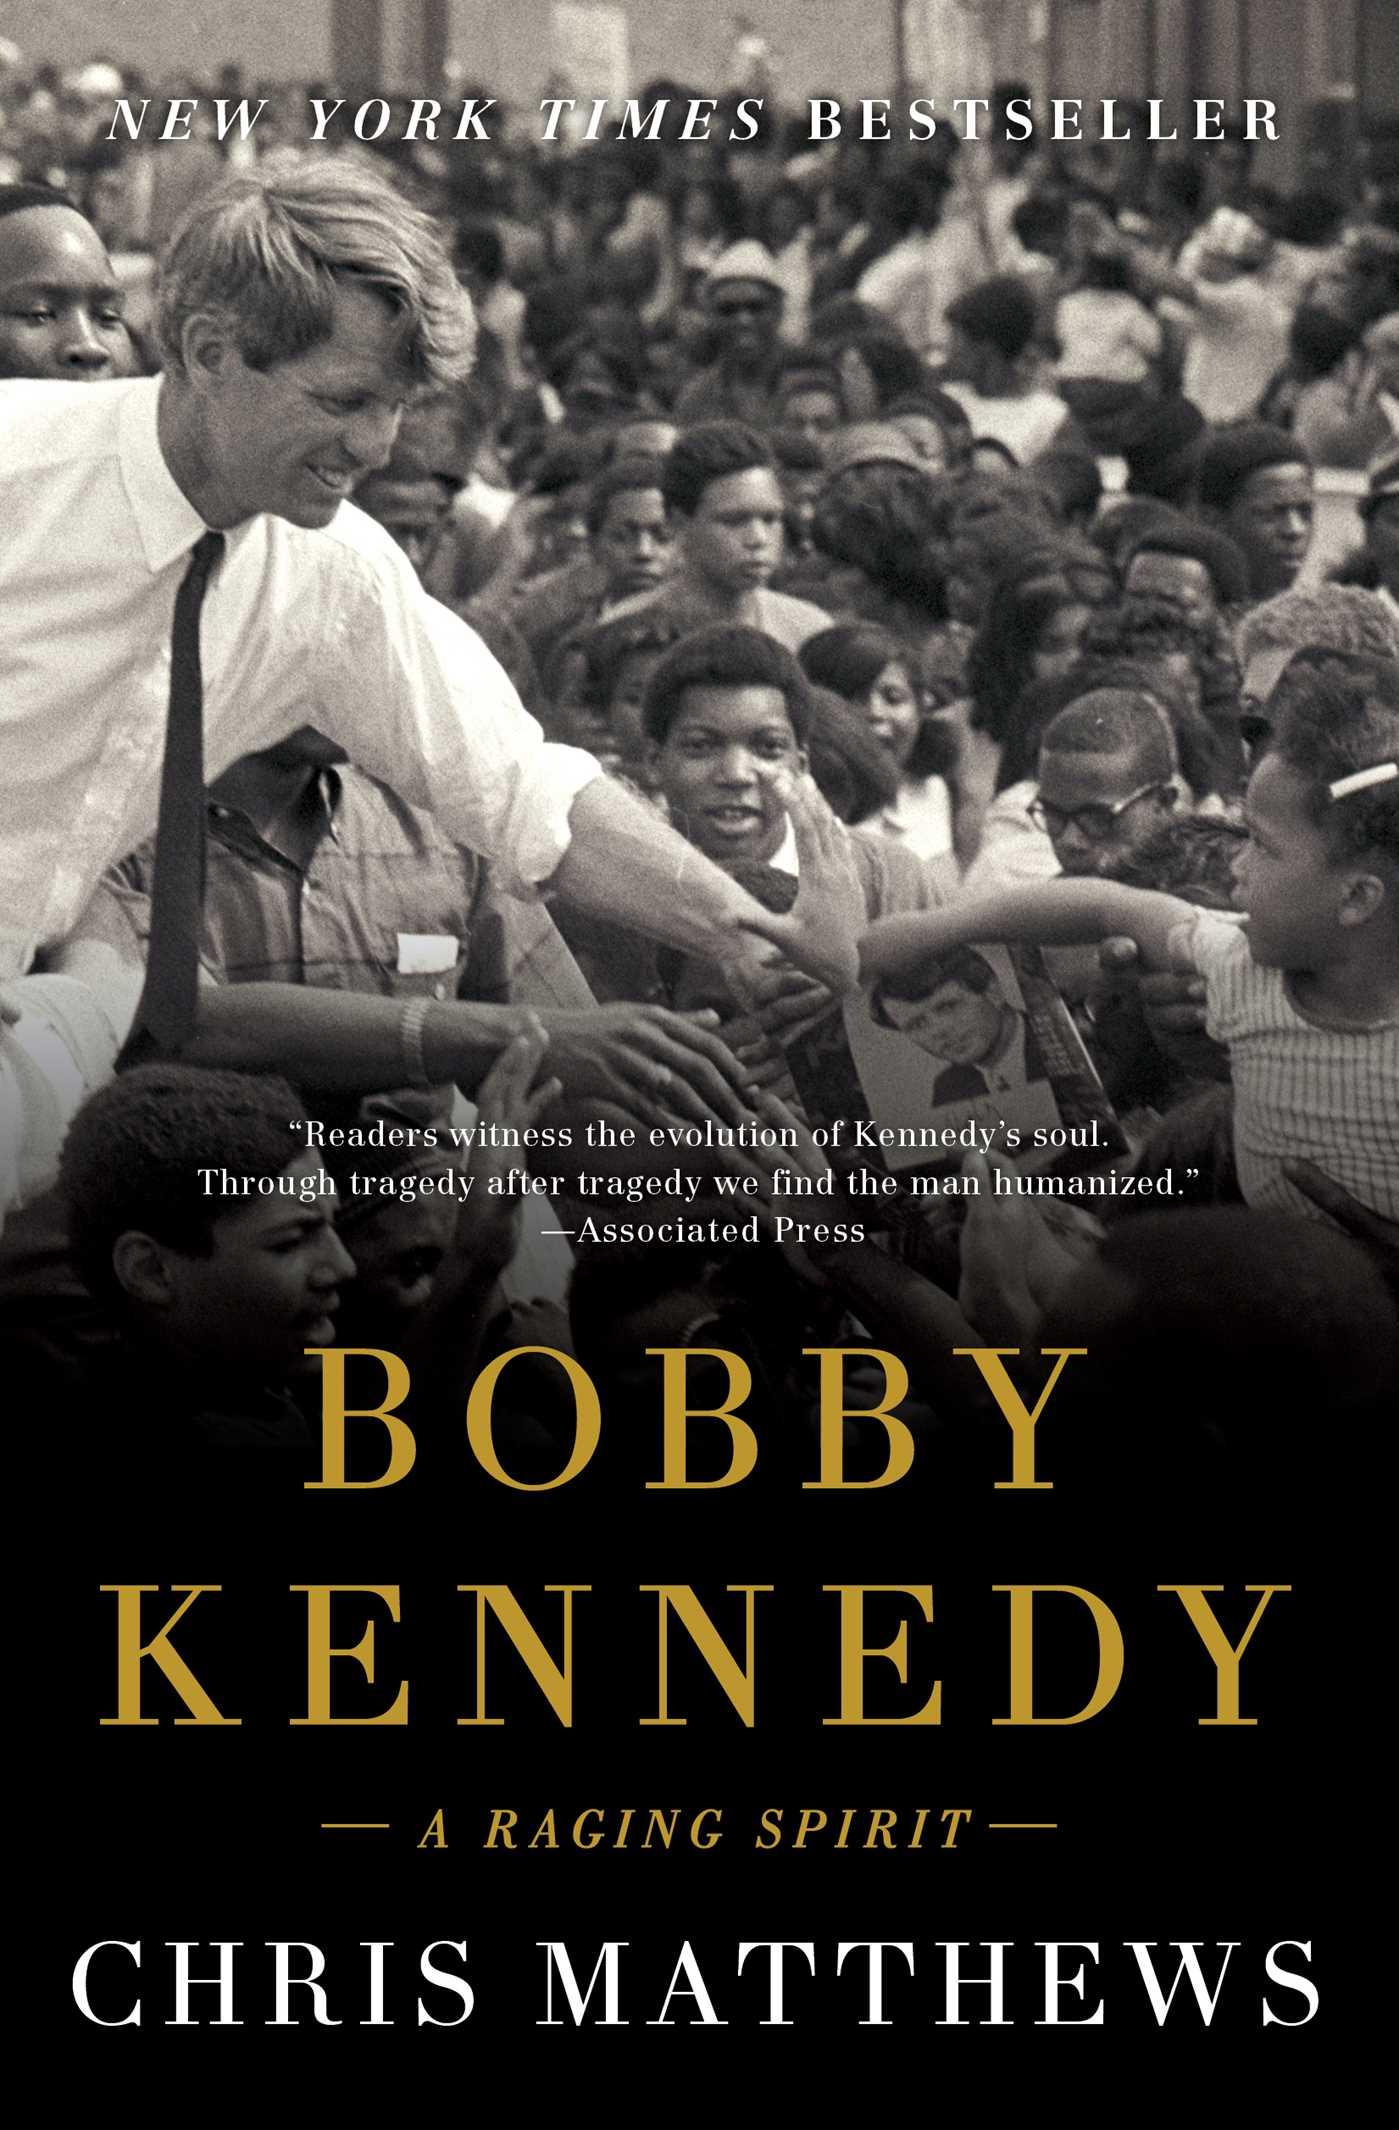 Bobby kennedy 9781501111877 hr